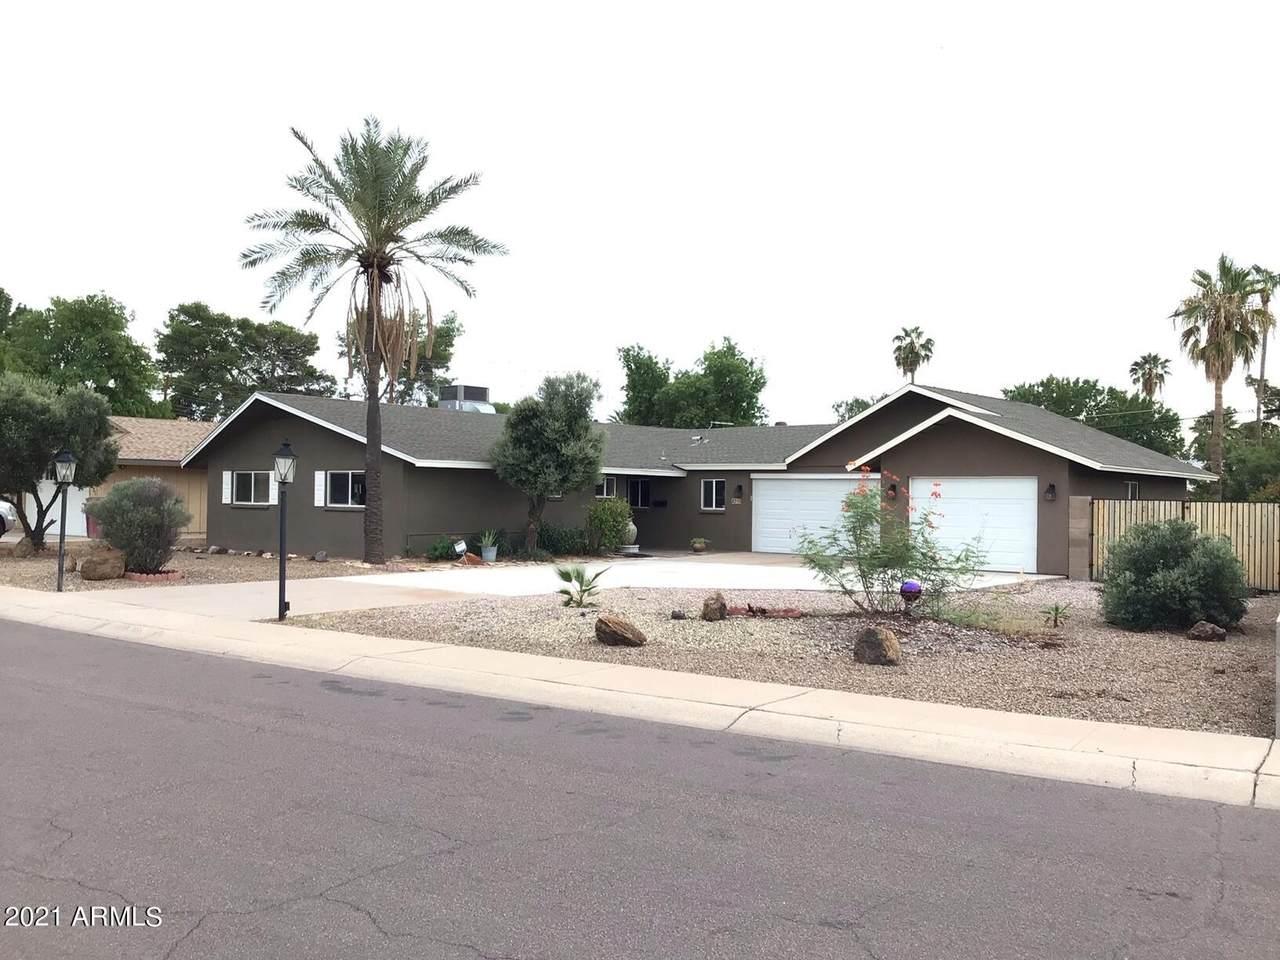 8313 Rancho Vista Drive - Photo 1